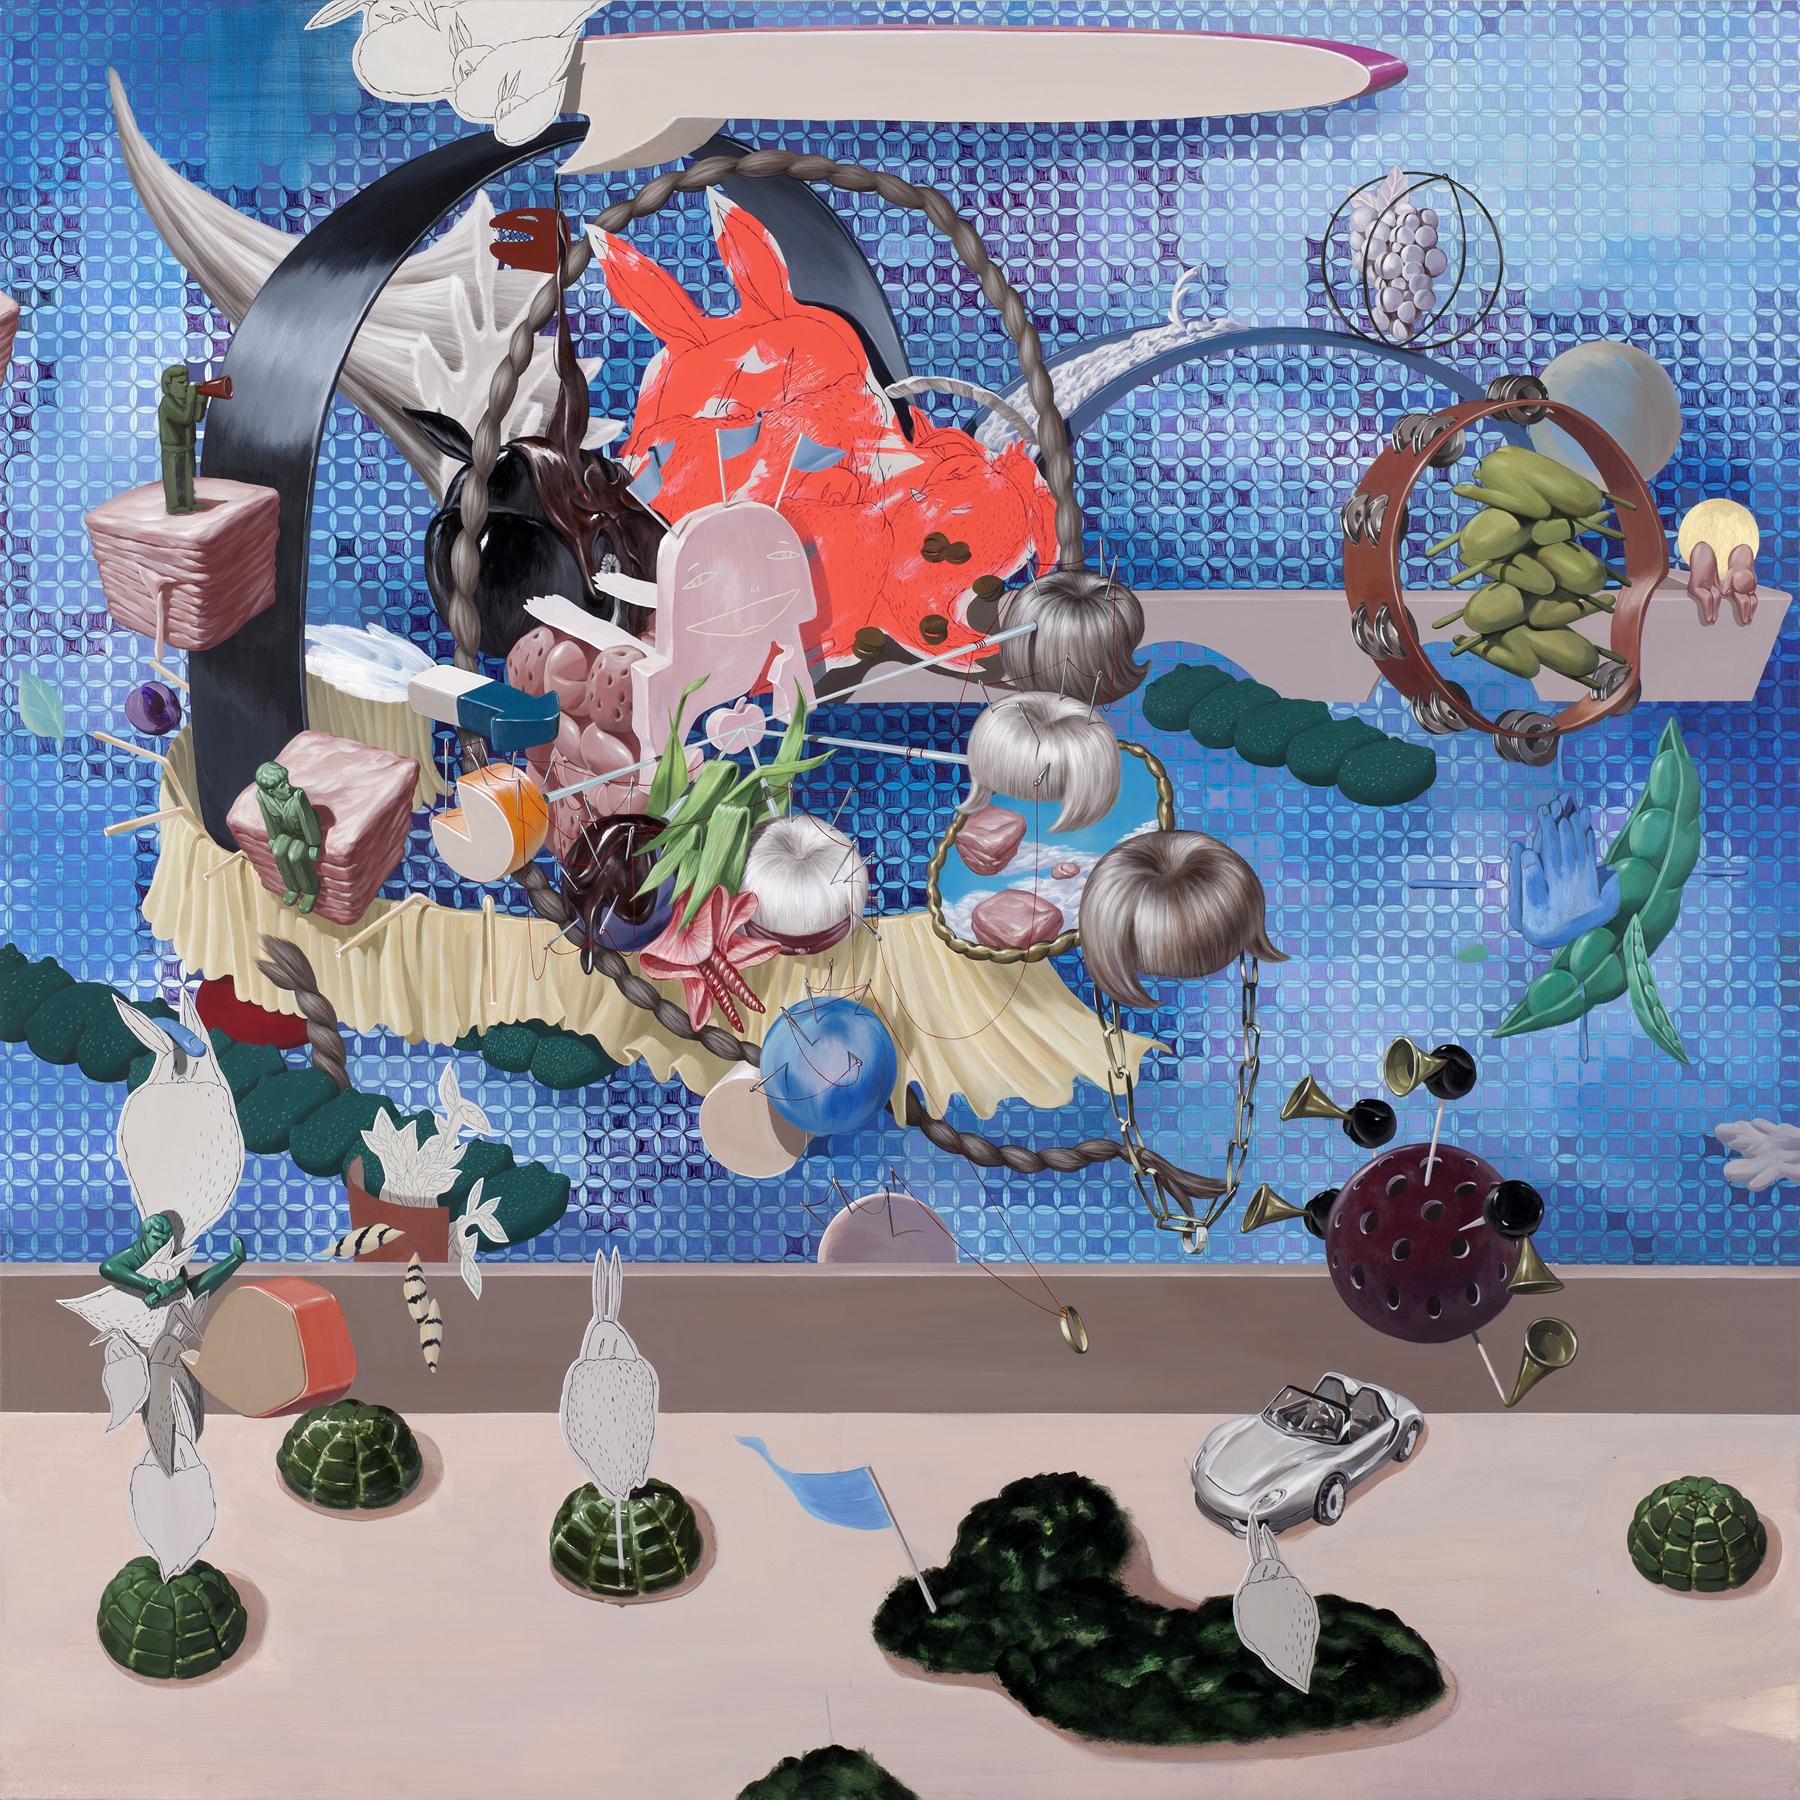 Silo thinking    2011,Acrylic on canvas, 145x145cm